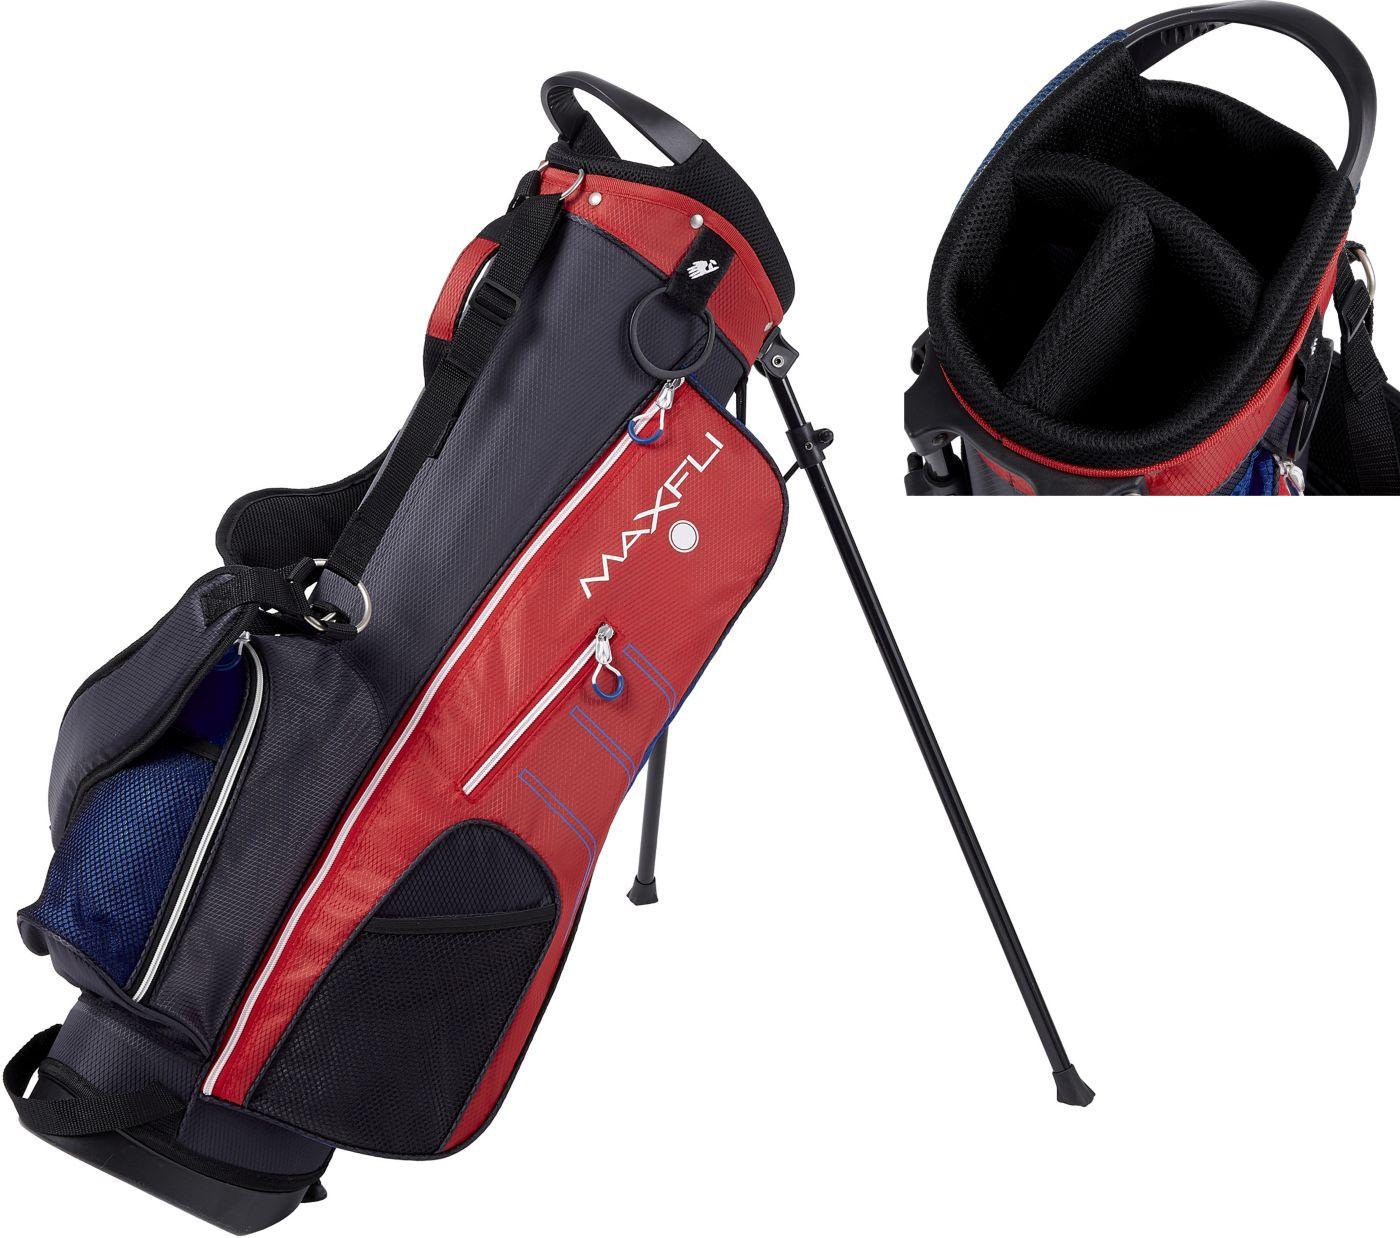 Maxfli Youth 2019 Sunday Stand Golf Bag